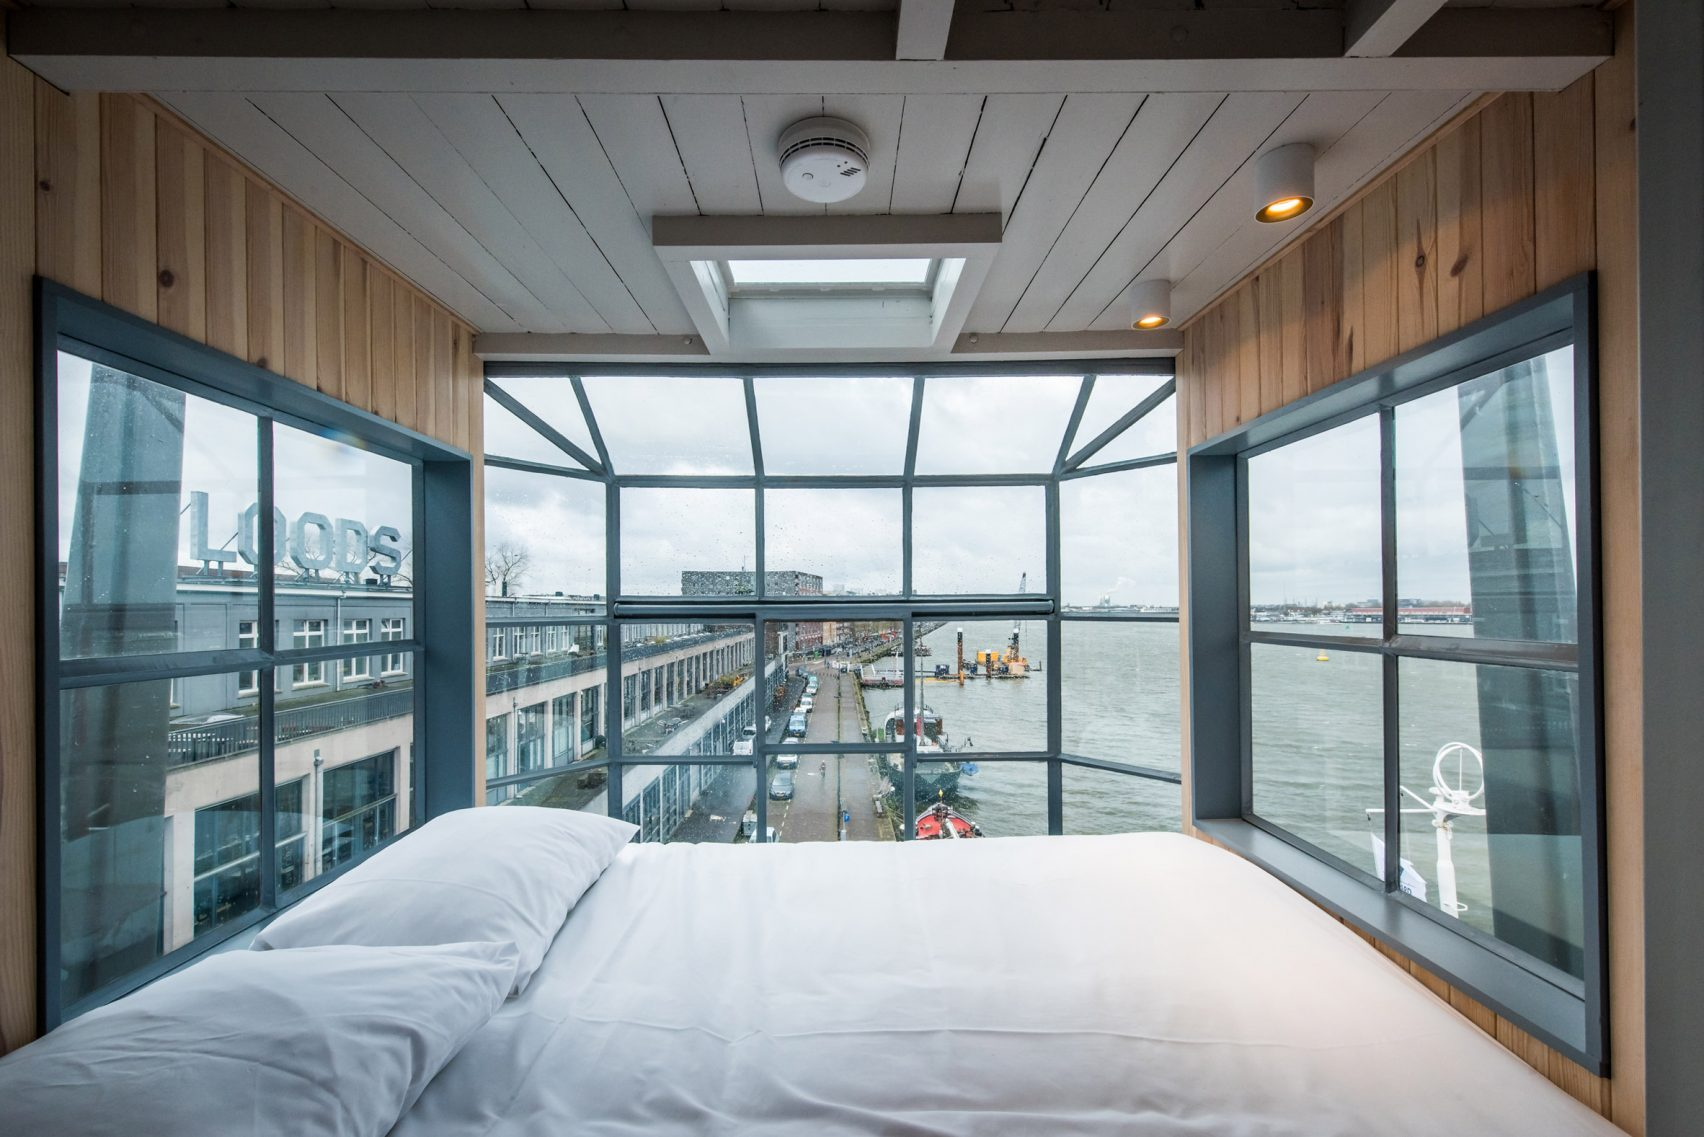 yays-crane-apartment-edward-van-vliet-architecture-interiors-netherlands_dezeen_2364_col_1-1704x1137